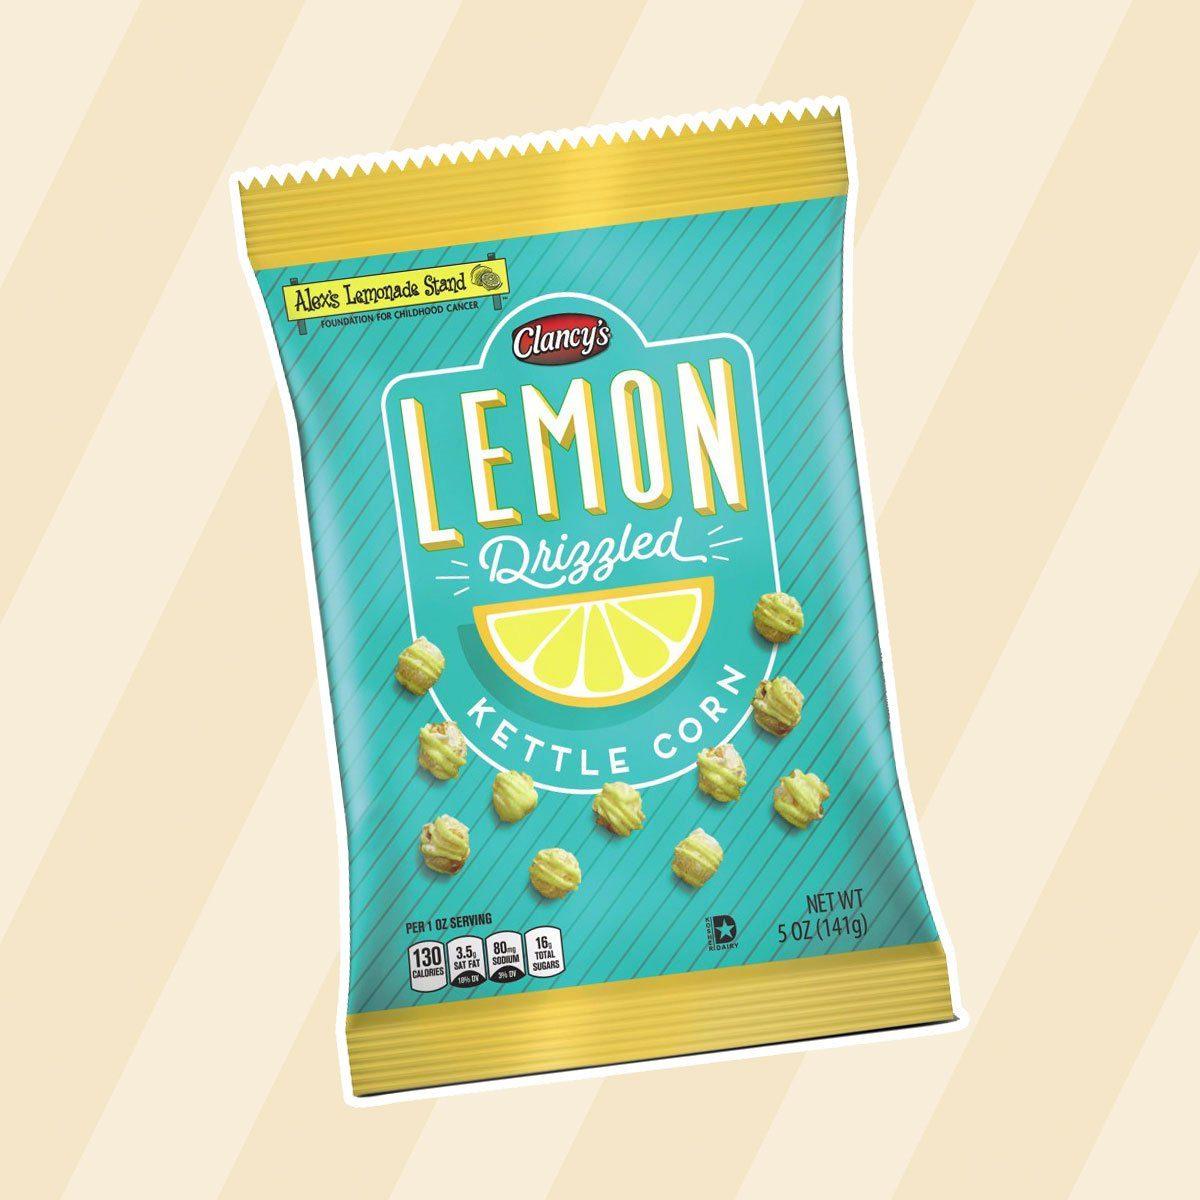 Lemon-drizzled kettle corn